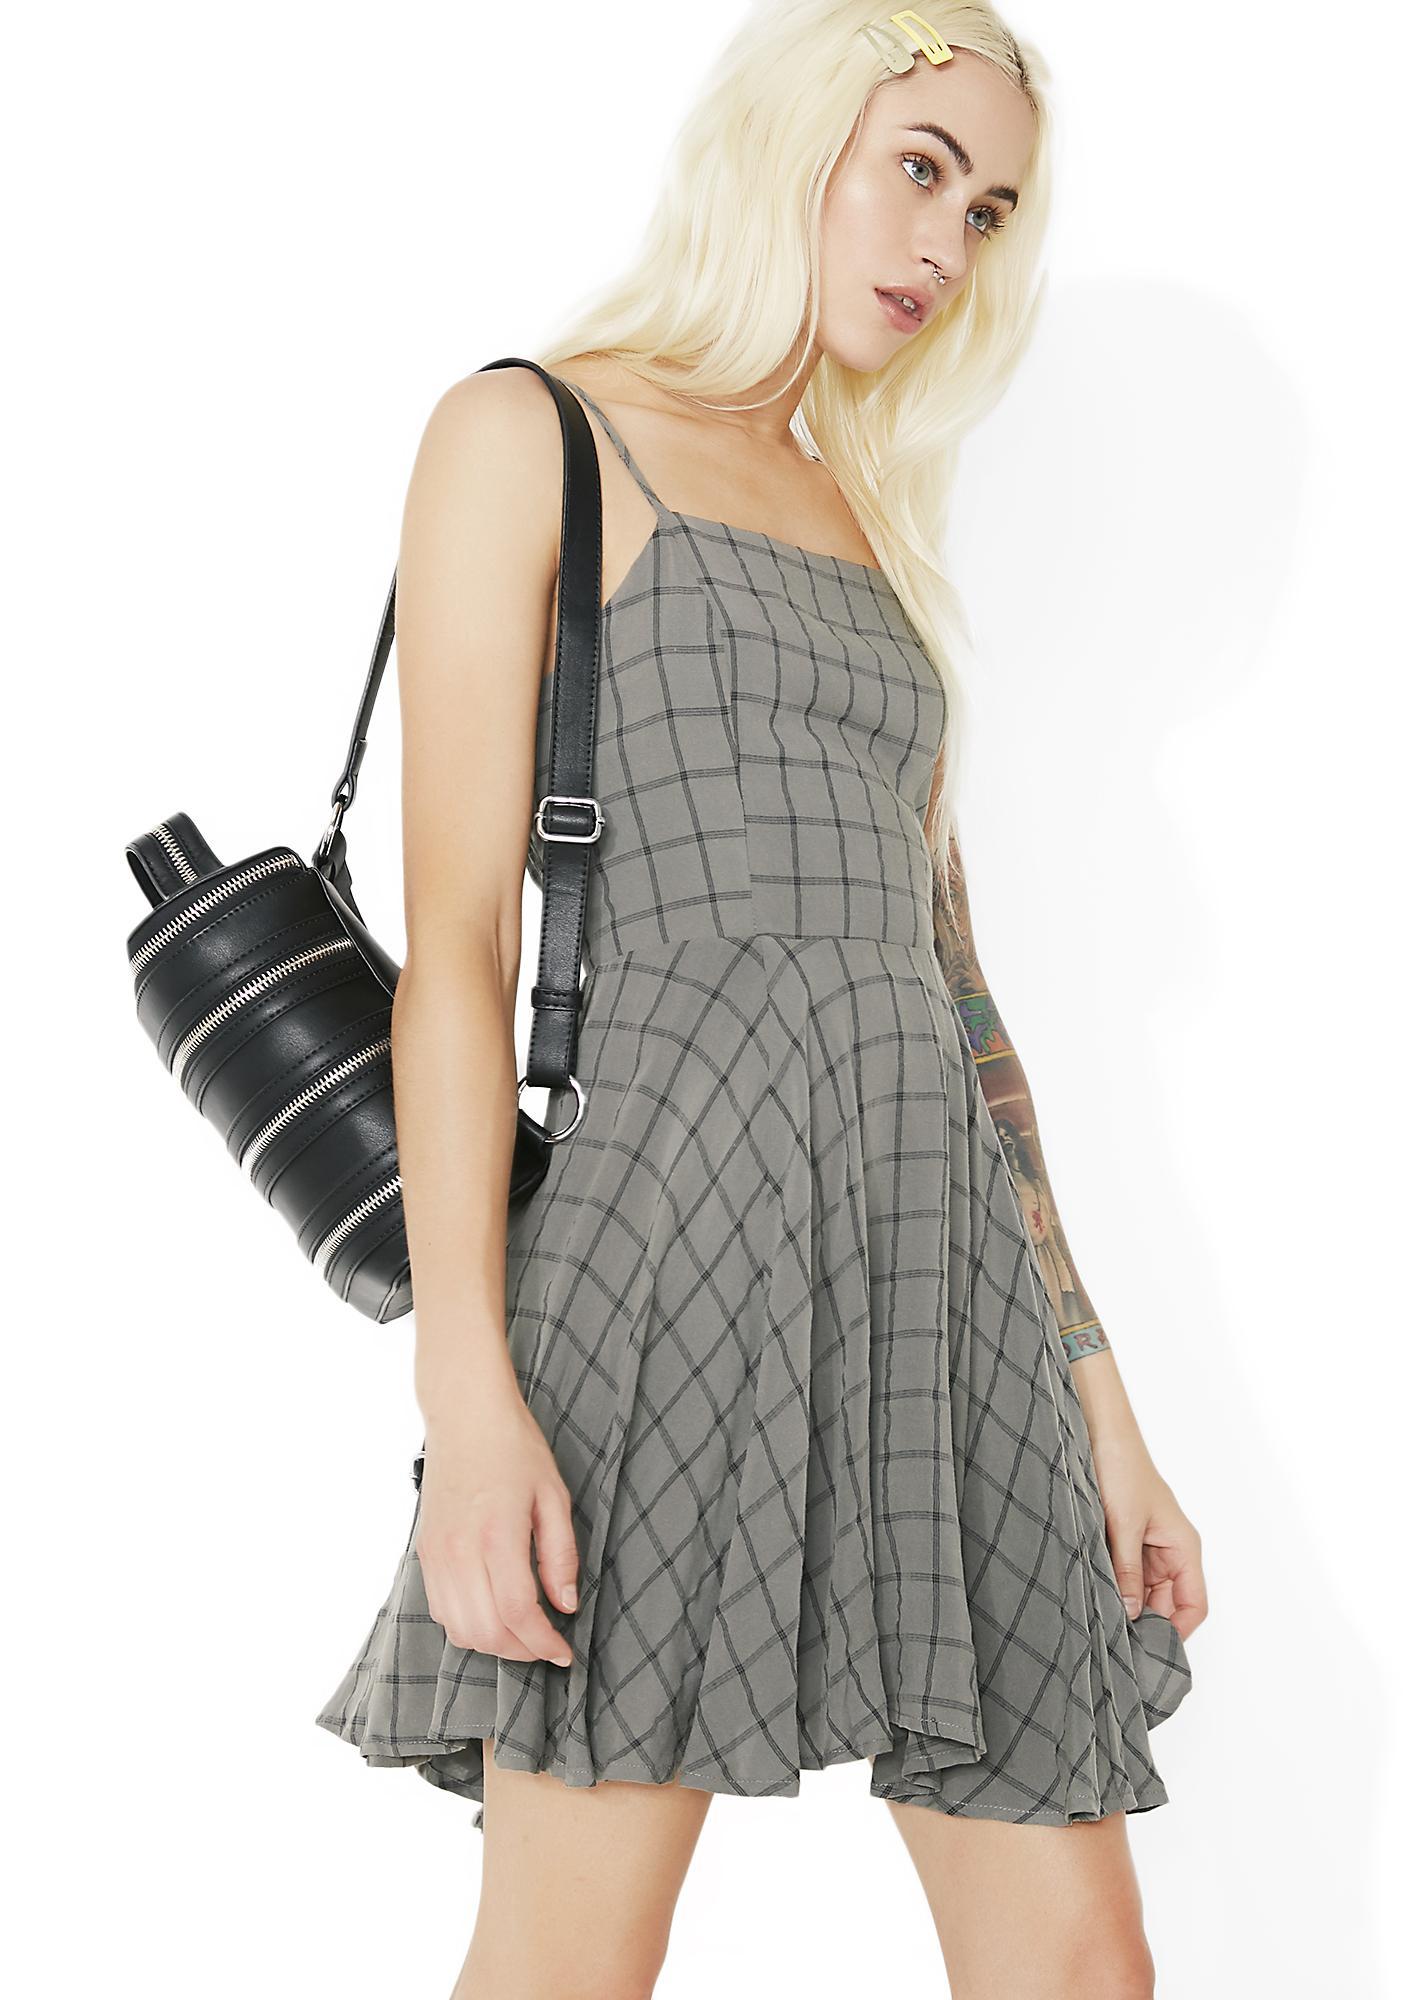 Lira Clothing Autumn Dress